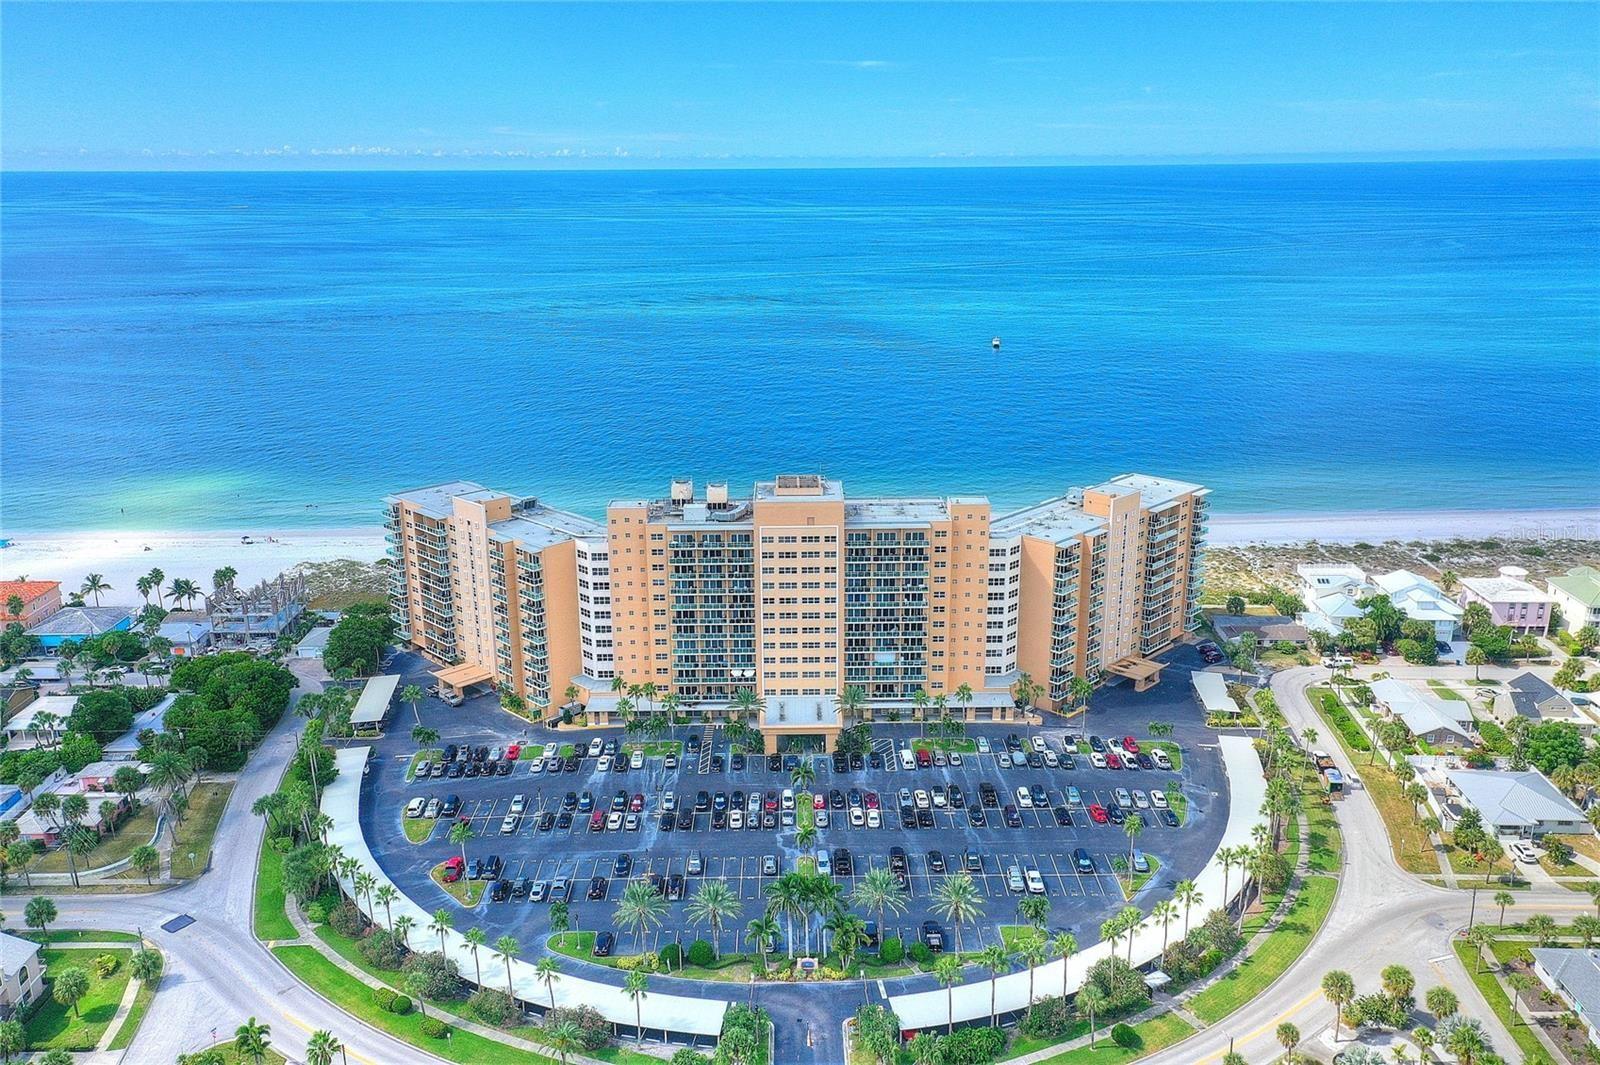 880 MANDALAY AVENUE #N610, Clearwater, FL 33767 - MLS#: U8140461